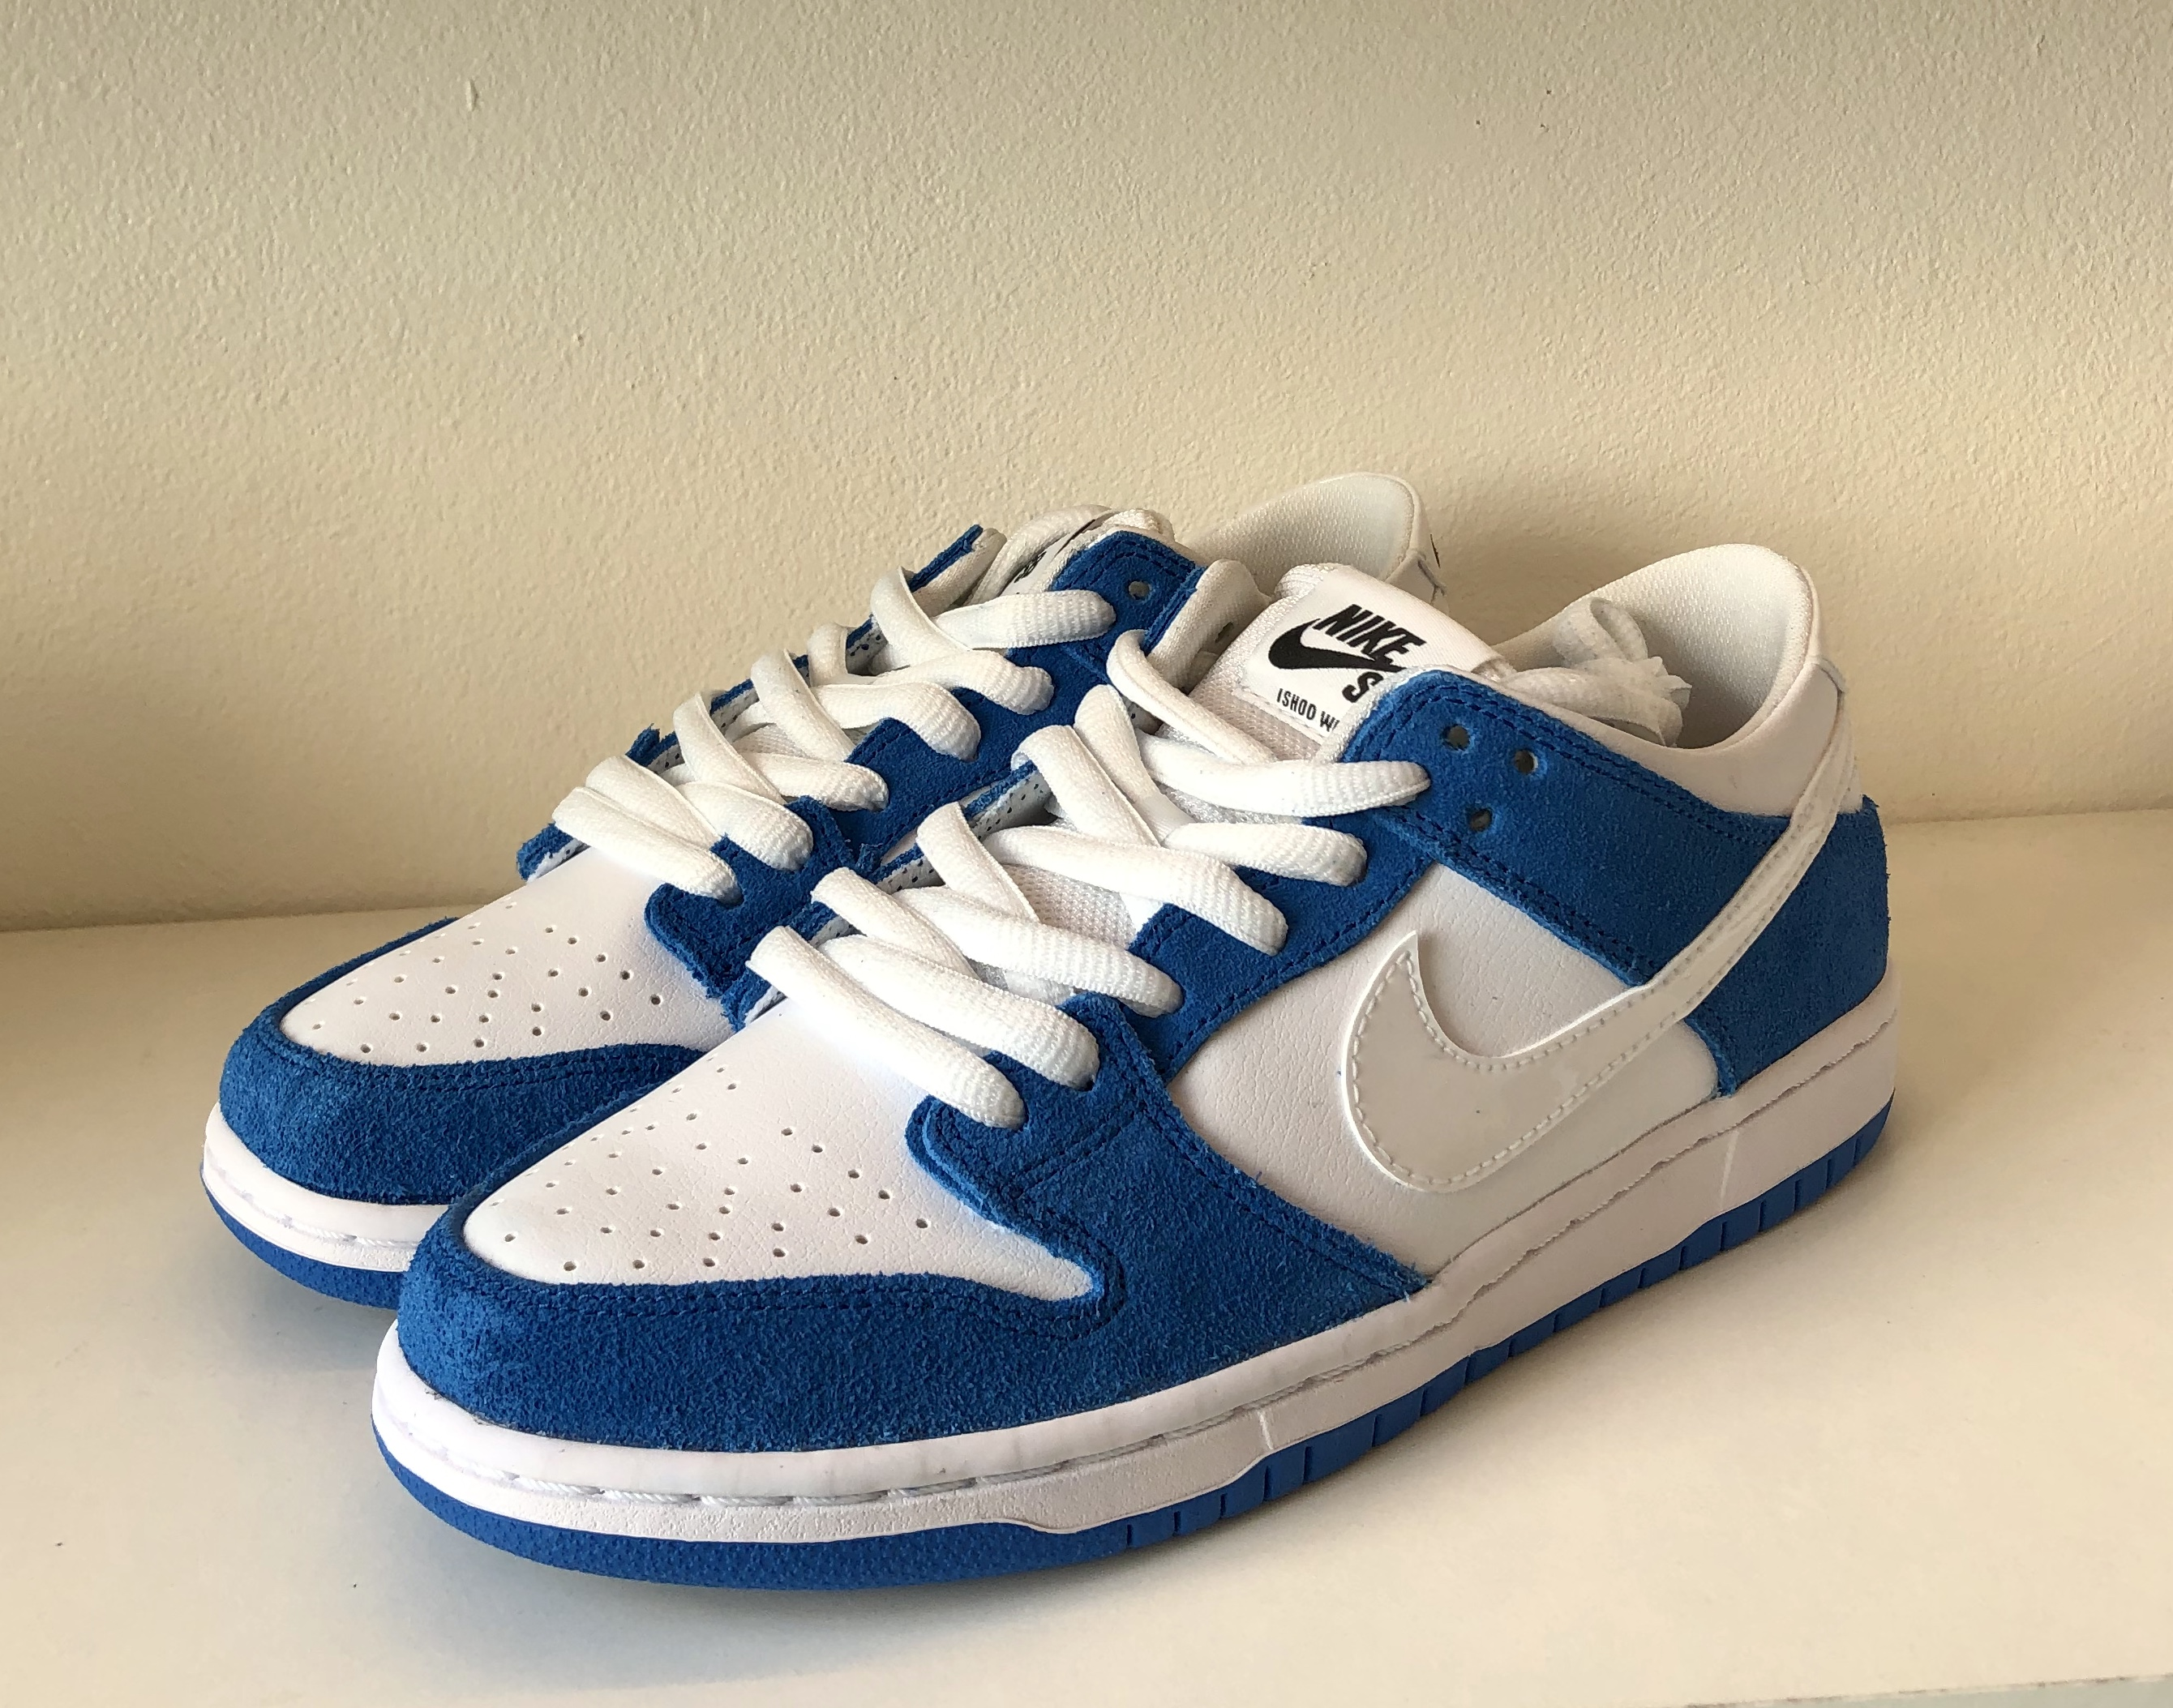 Nike SB Dunk Low Ishod Wair Blue Spark